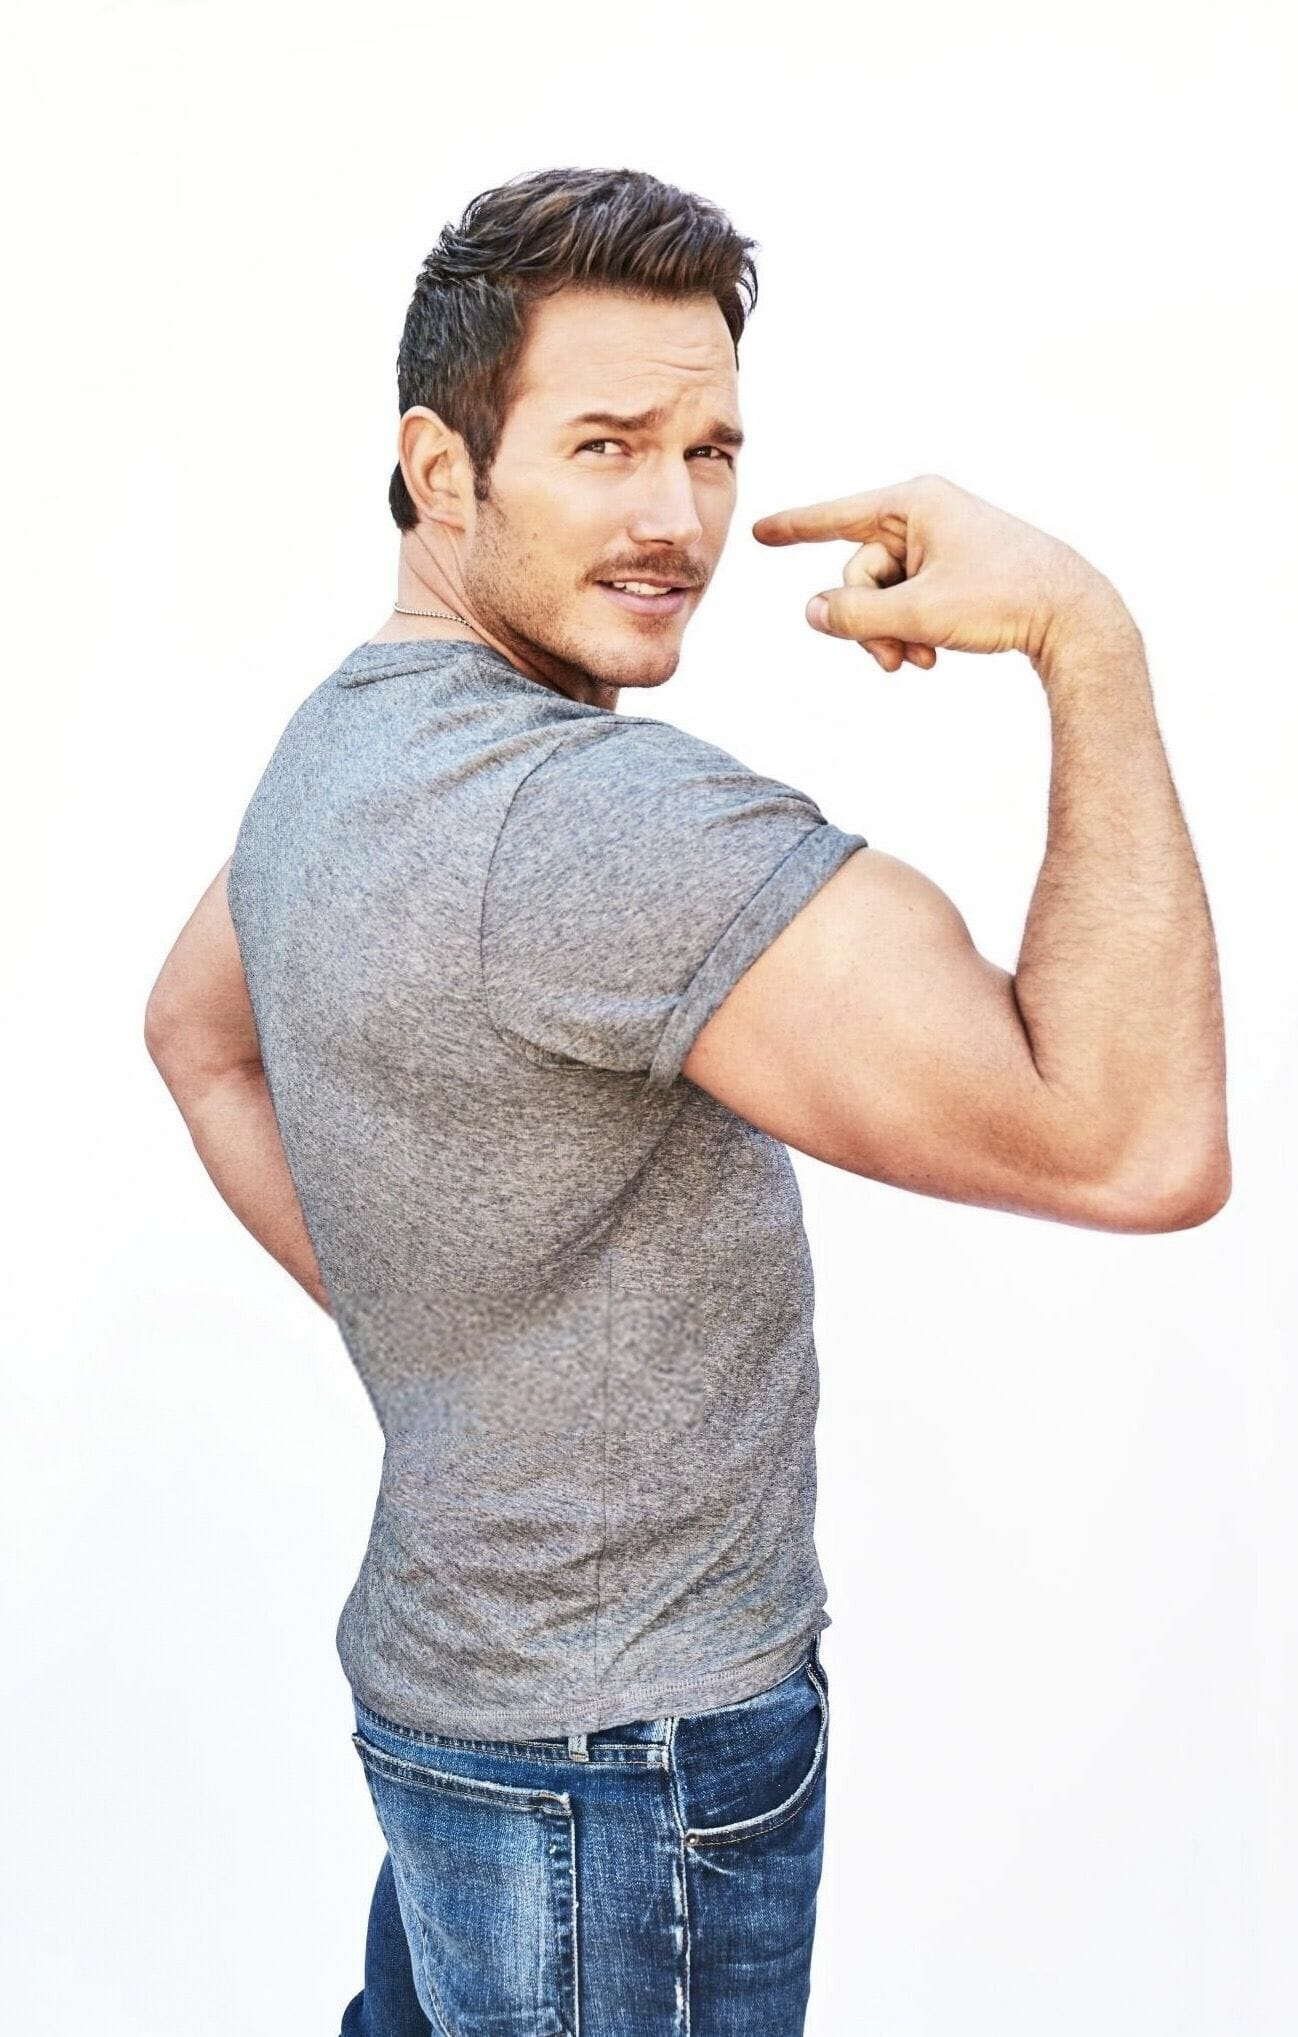 Chris Pratt big muscles